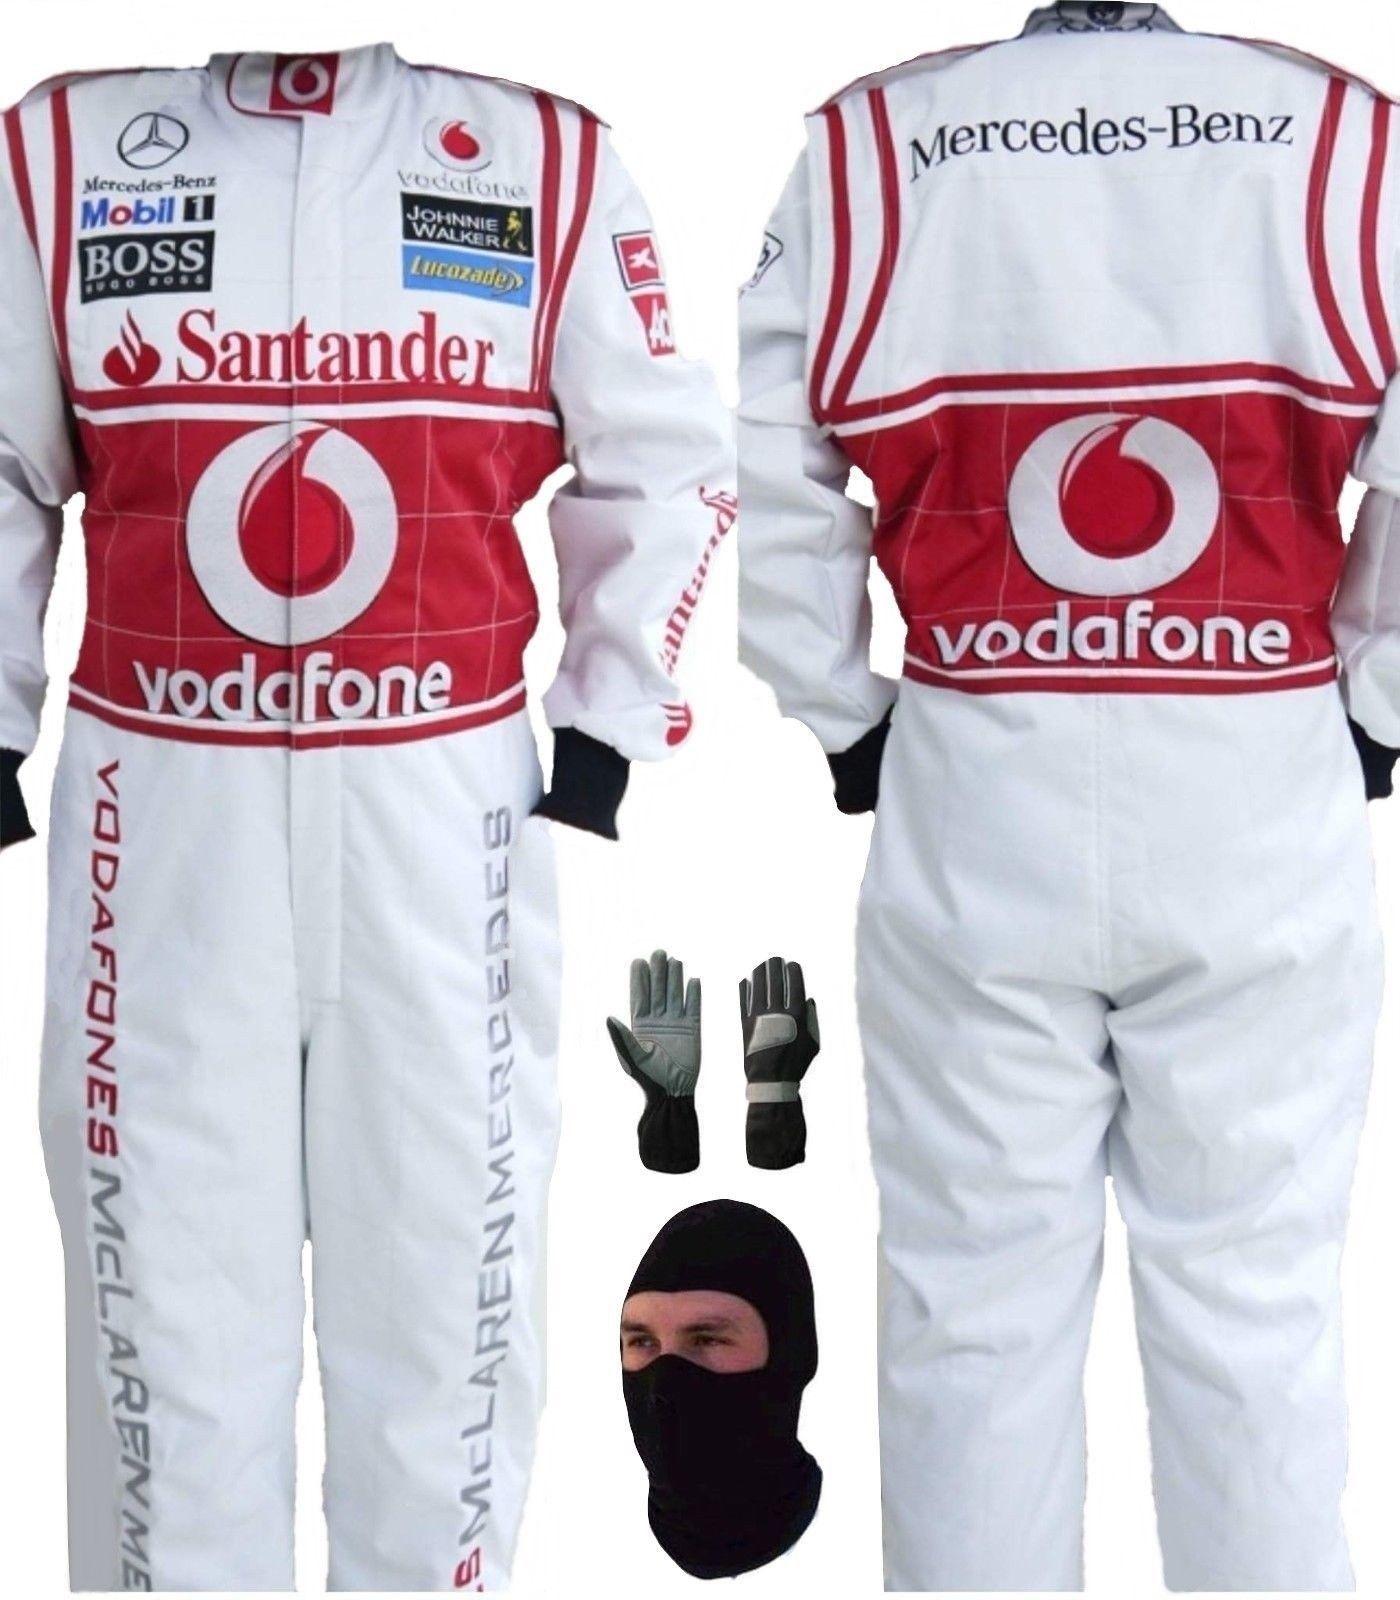 GO KART VODAFONE MCLAREN RACE SUIT CIK/FIA LEVEL 2 2013 WITH FREE GIFTS